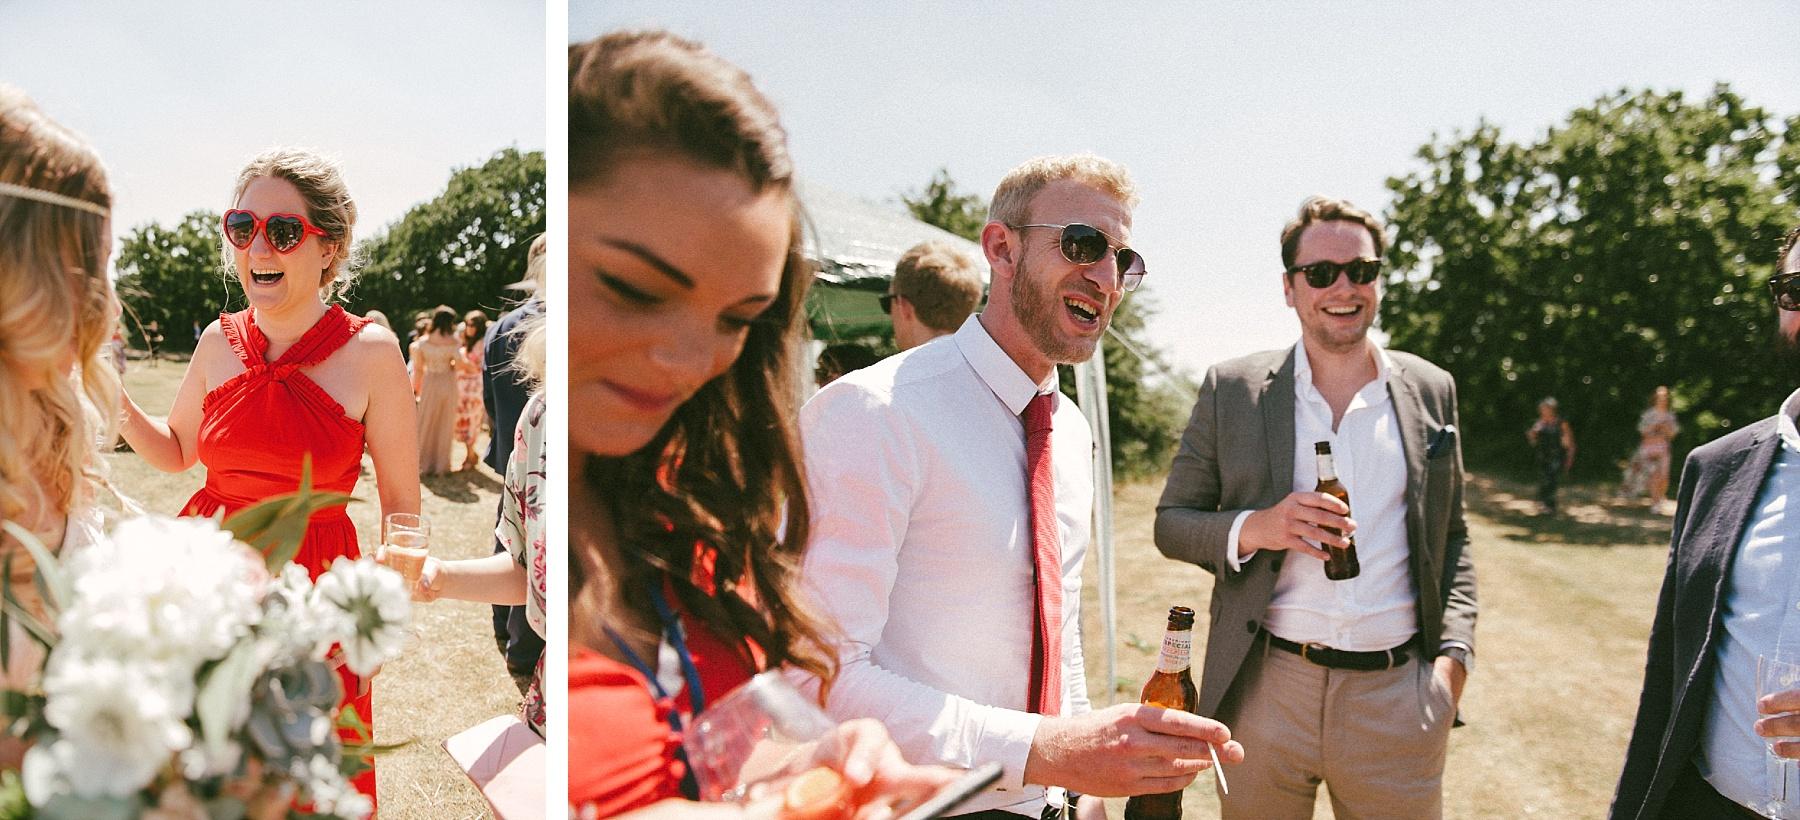 Summer wedding Turnbury Woods